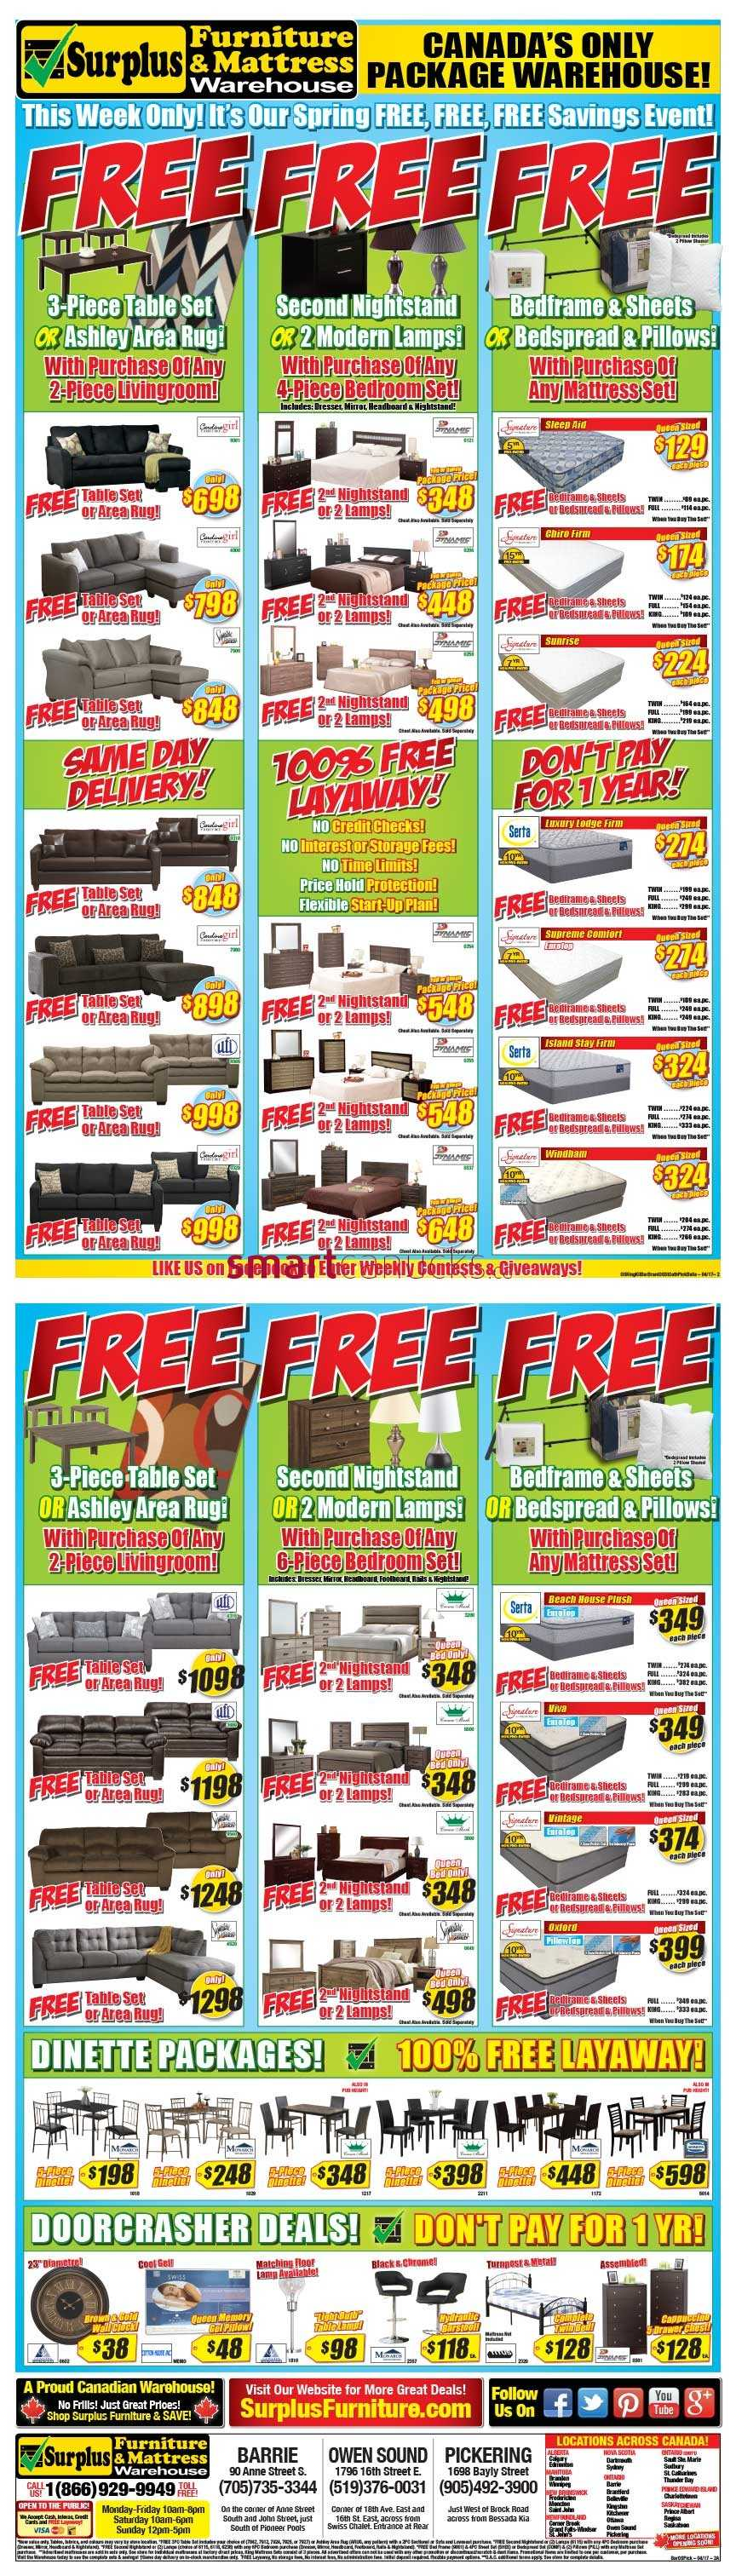 Surplus furniture and mattress warehouse canada flyers for Surplus furniture and mattress barrie